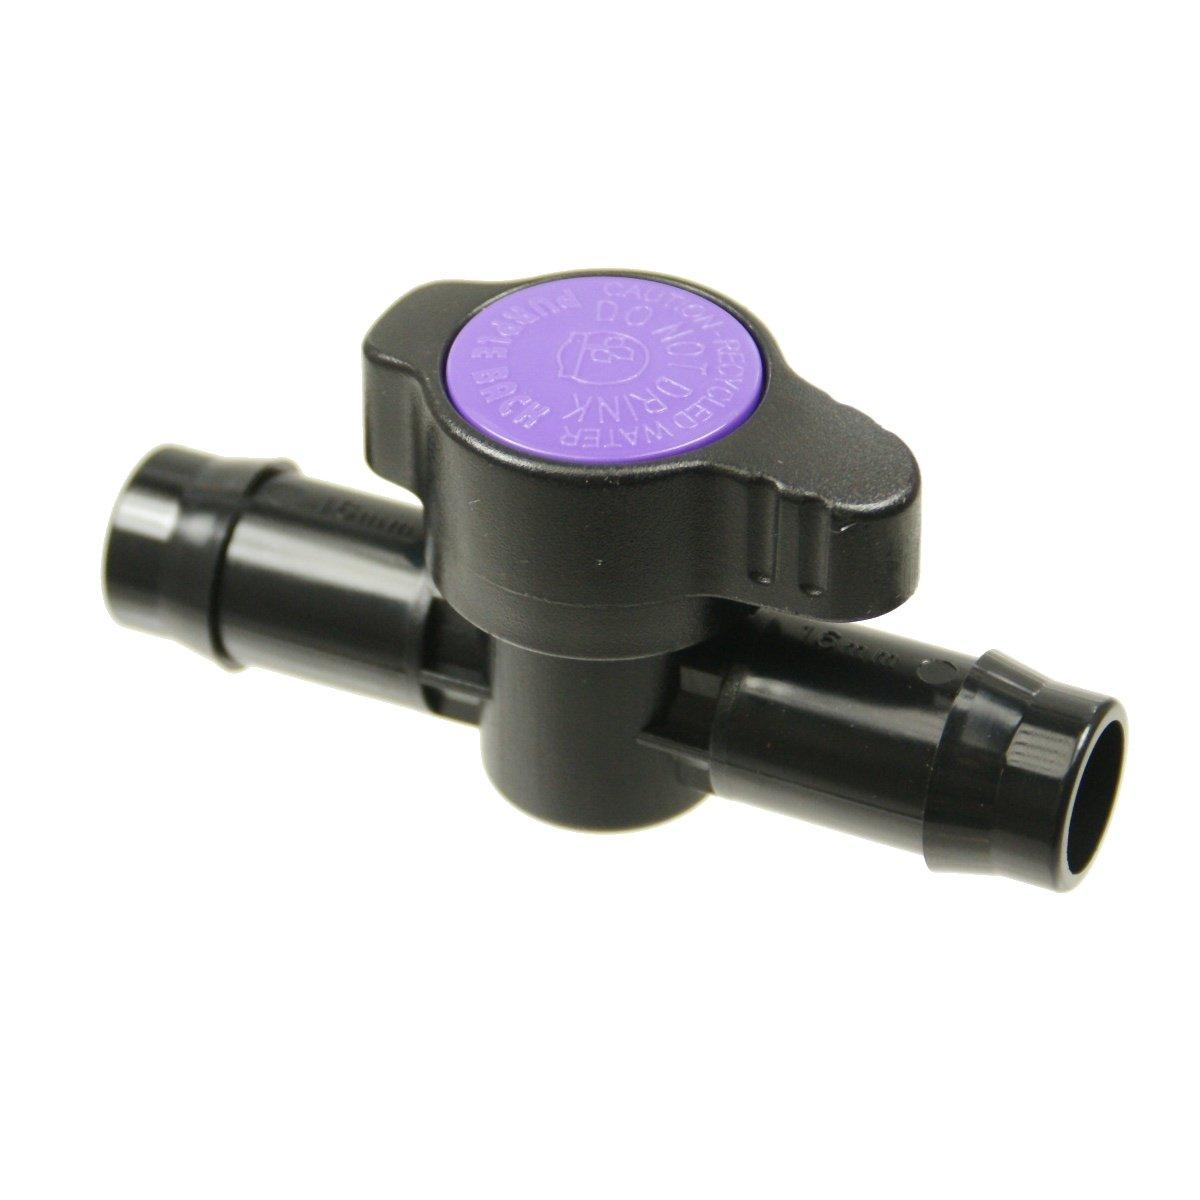 Antelco 1/2' Barb Tubing Coupling Valve - Purple for Drip Irrigation